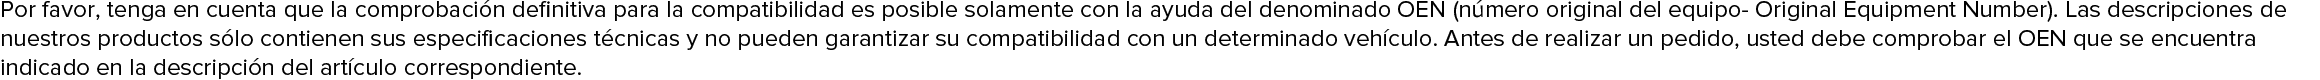 CASTROL 0501CA127C33452411 Aceite de horquilla